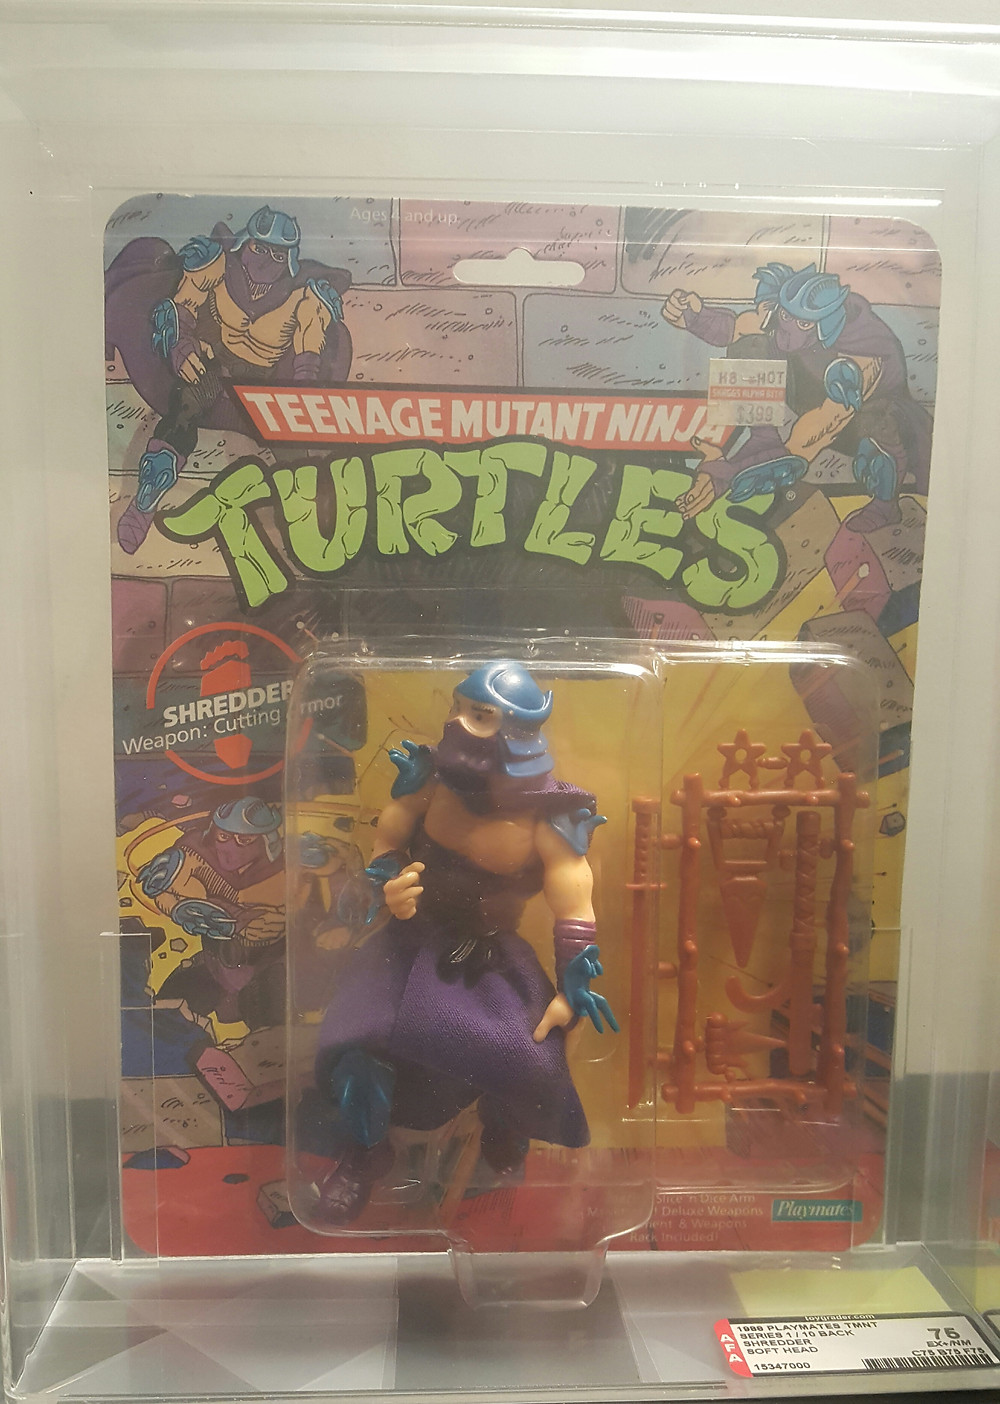 Vrhobbies we specialize in Teenage Mutant Ninja Turtles Varitiaons and MOC items http://www.valleygoto.com